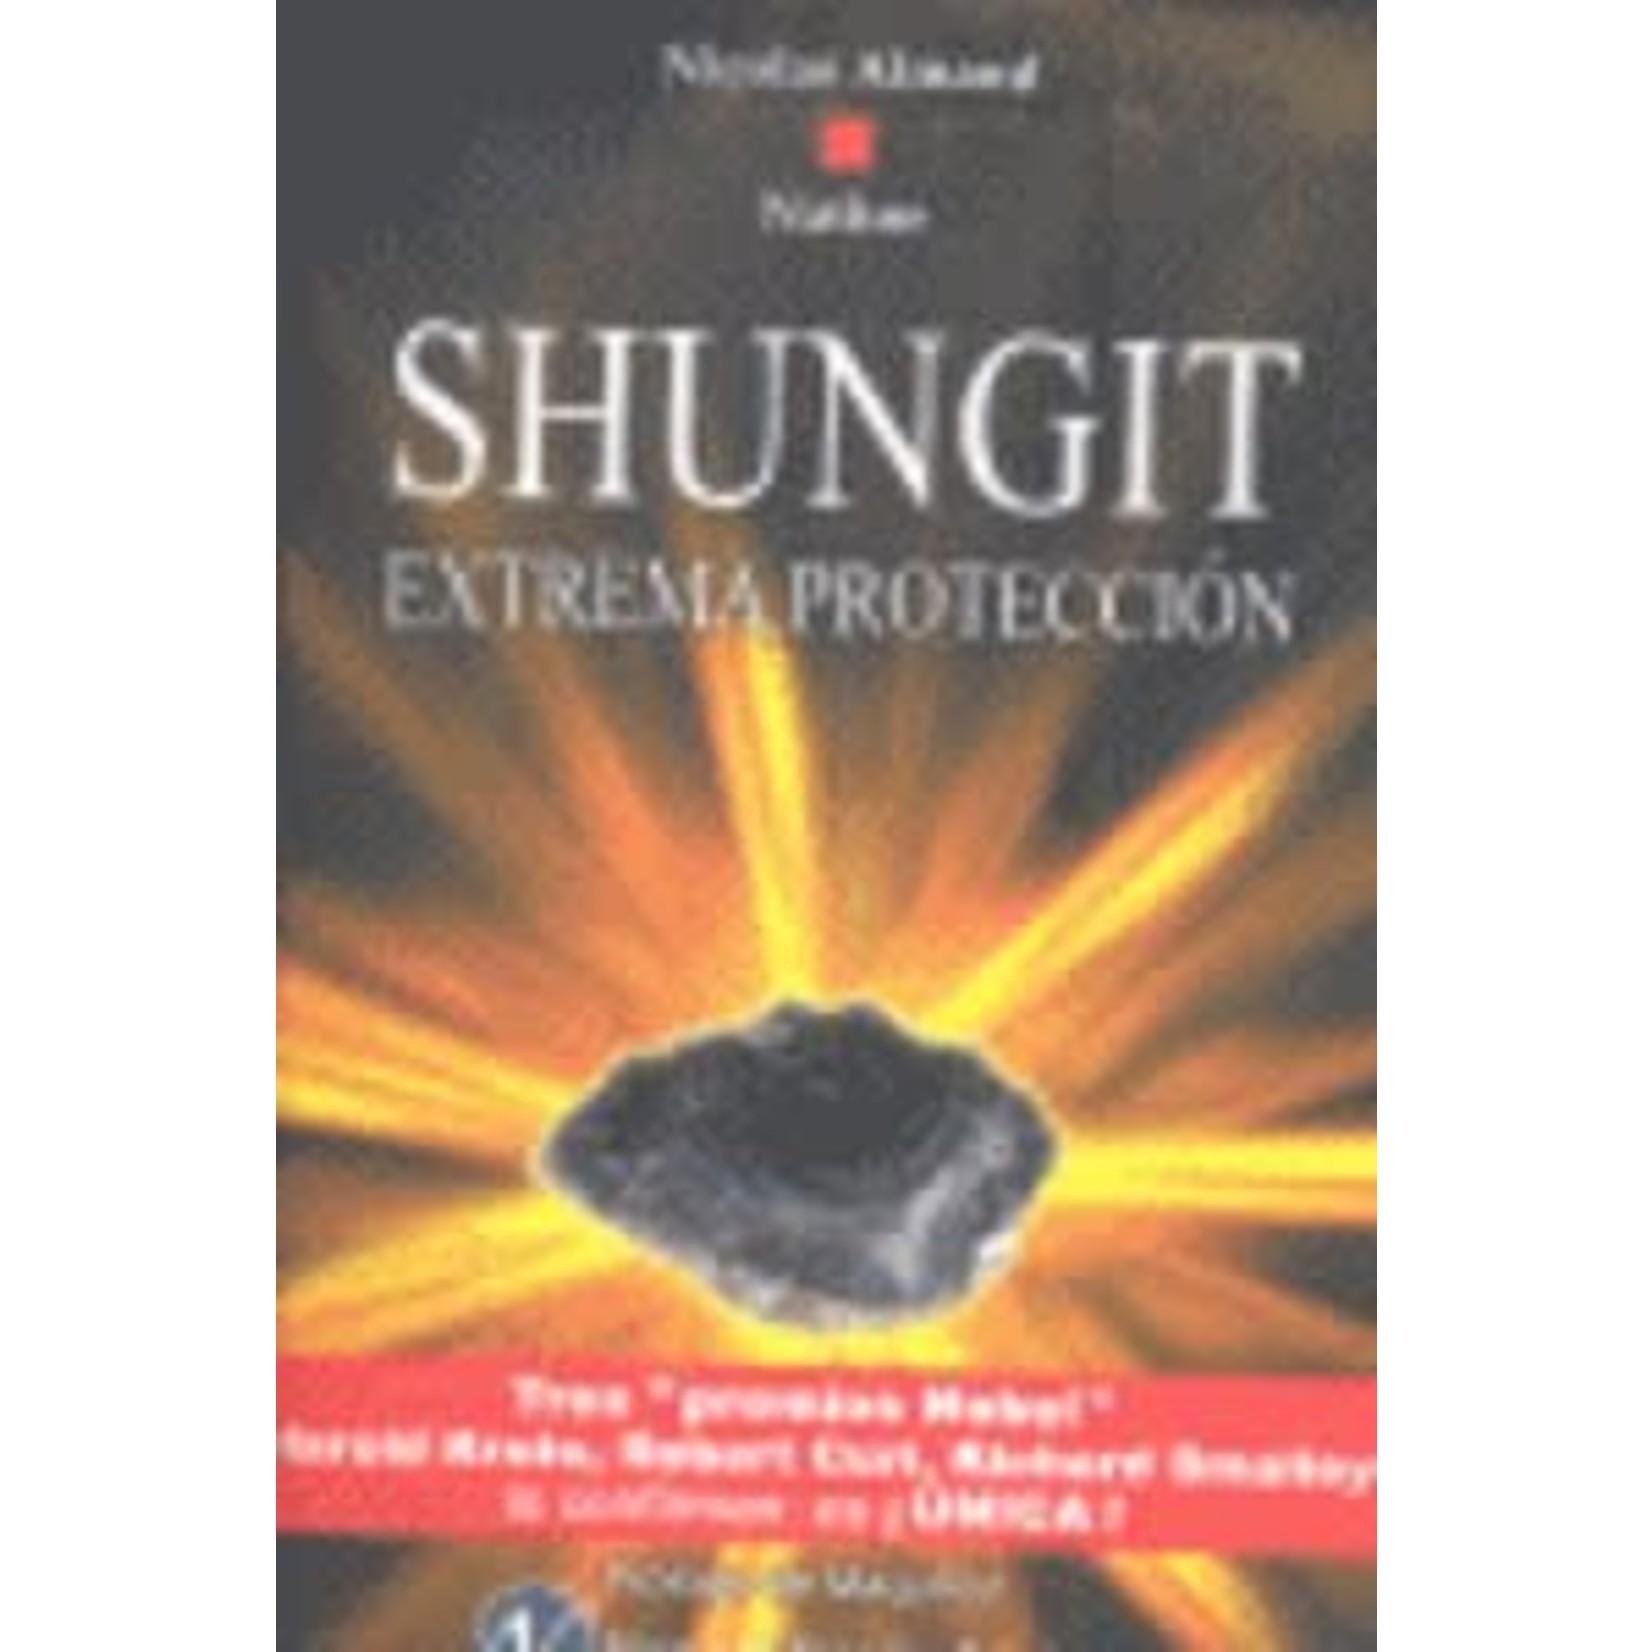 SHUNGIT EXTREMA PROTECCION